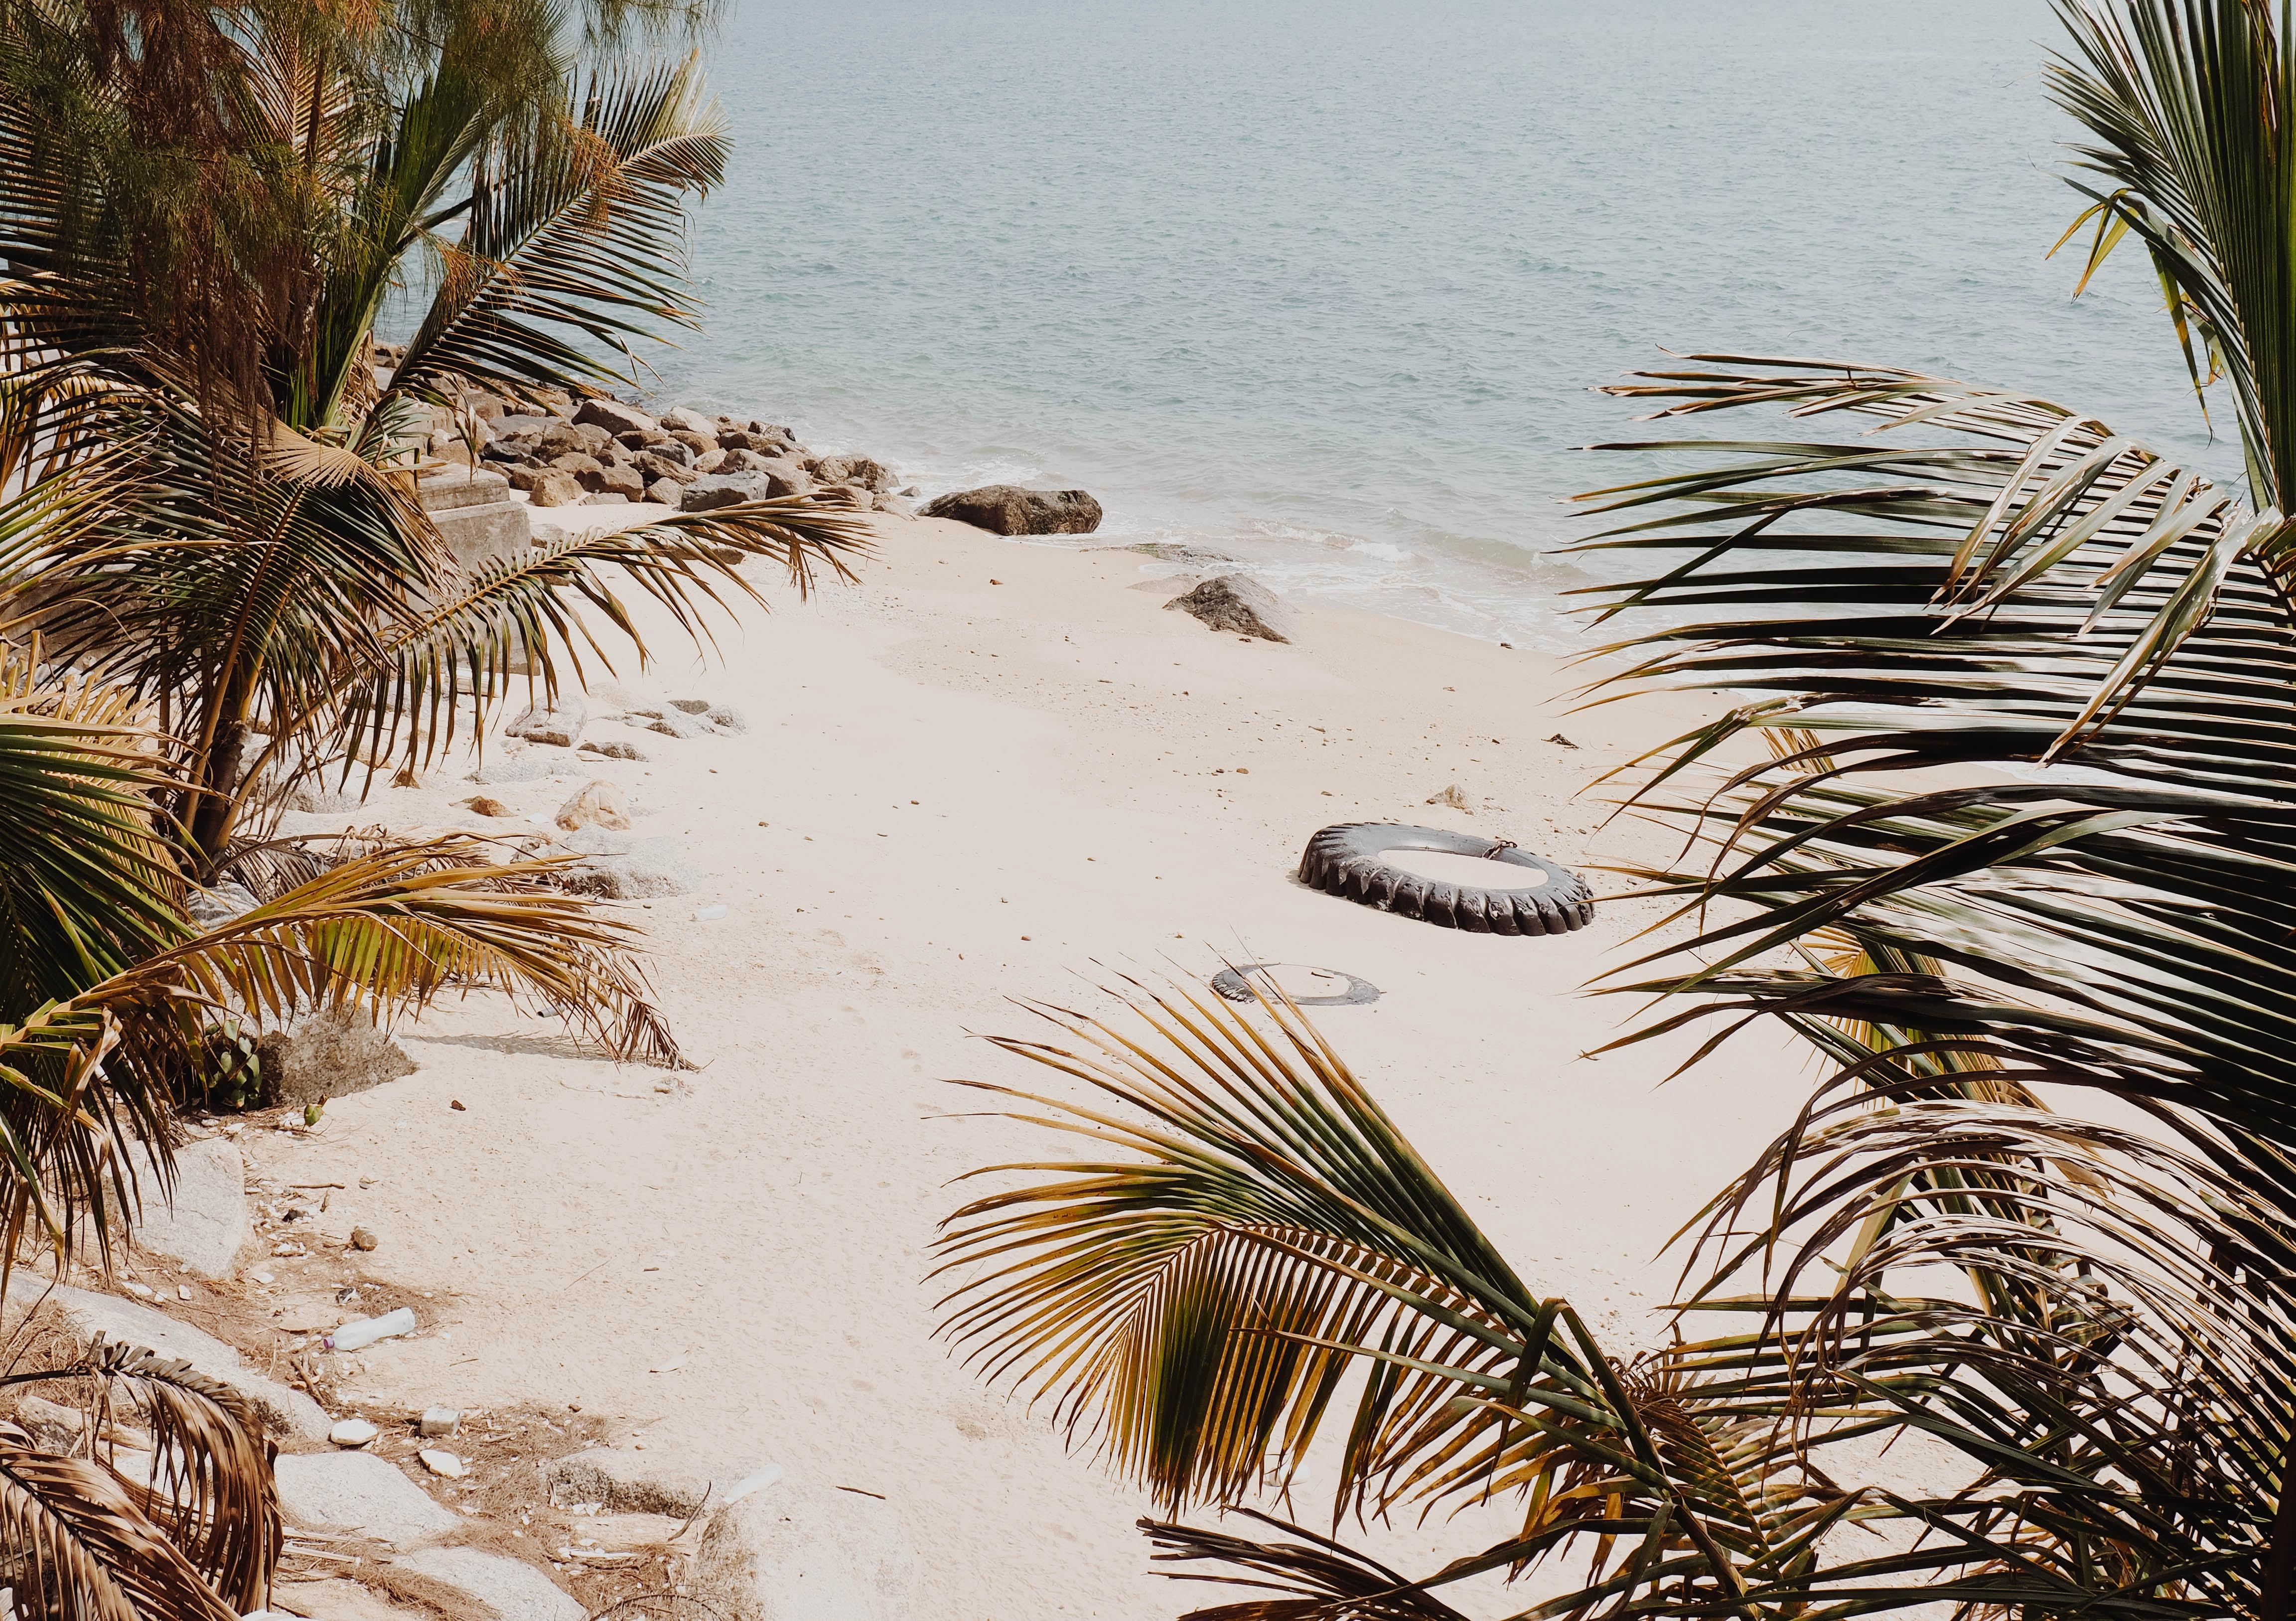 coconut palm trees near seashore at daytime